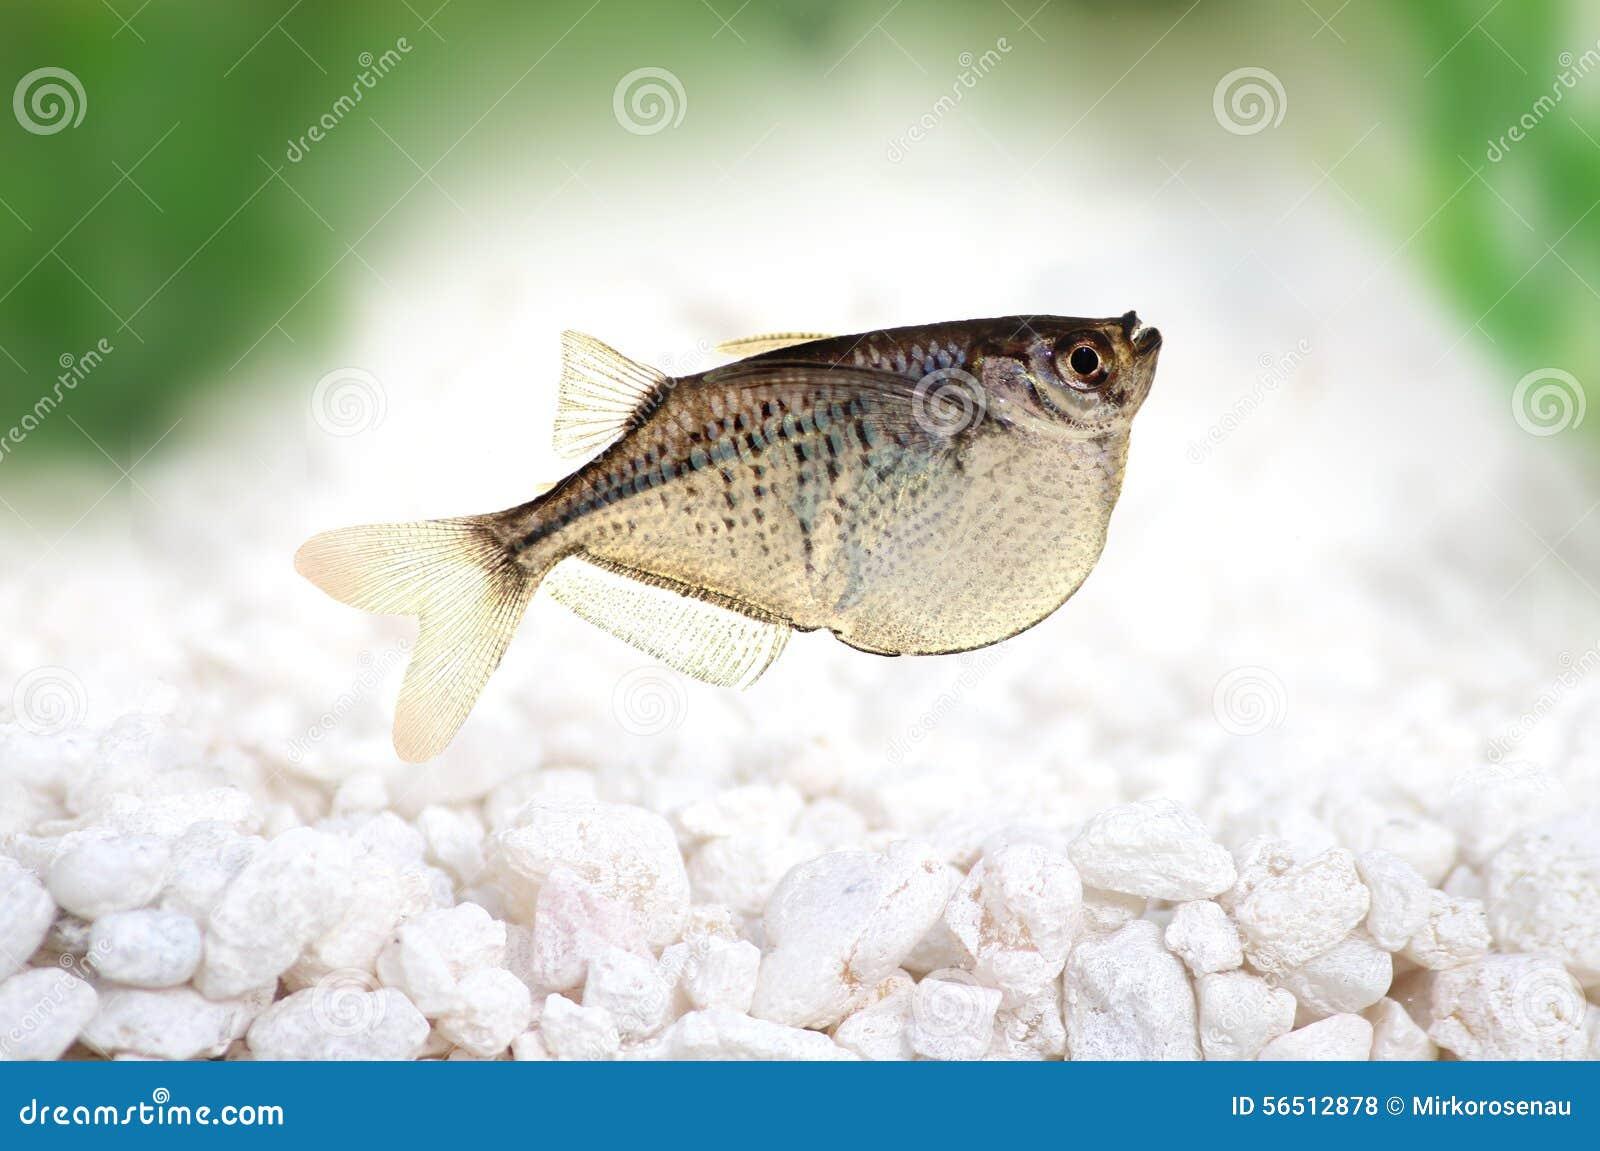 Common Silver Hatchetfish Gasteropelecus sternicla